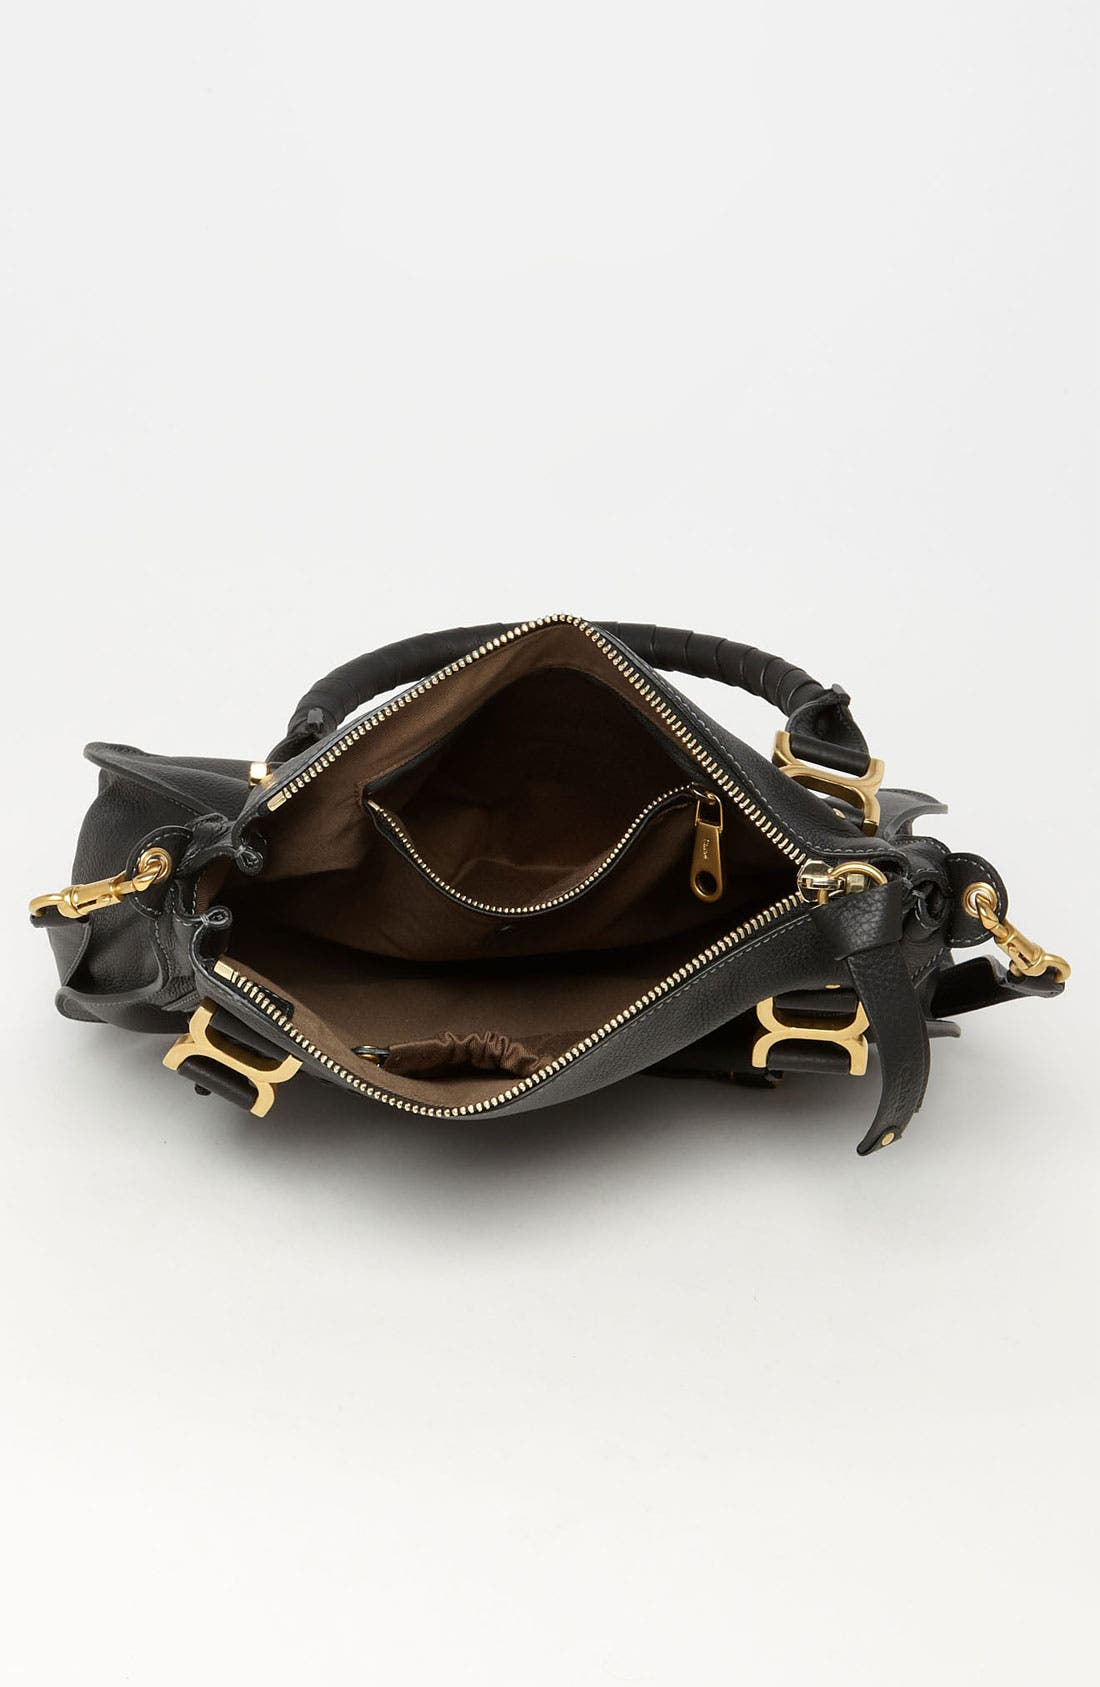 CHLOÉ, 'Medium Marcie' Leather Satchel, Alternate thumbnail 9, color, BLACK GOLD HRDWRE